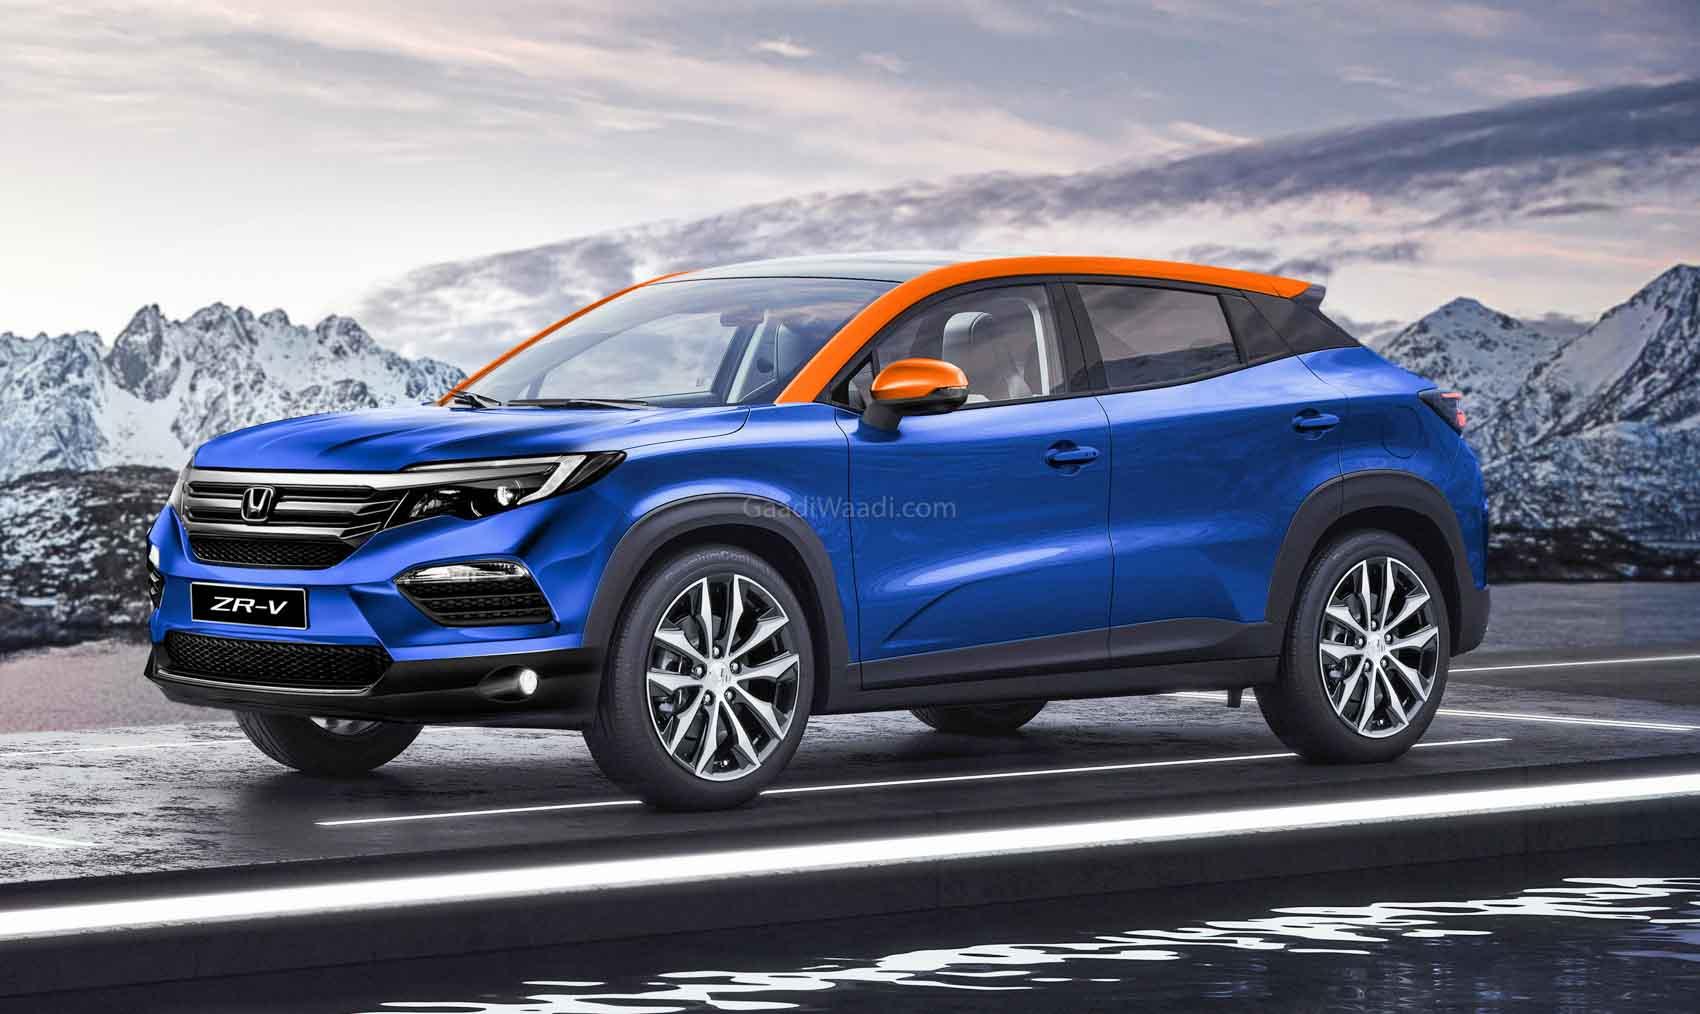 Honda To Launch 2 New SUVs (Vitara Brezza & Seltos Rival) In India